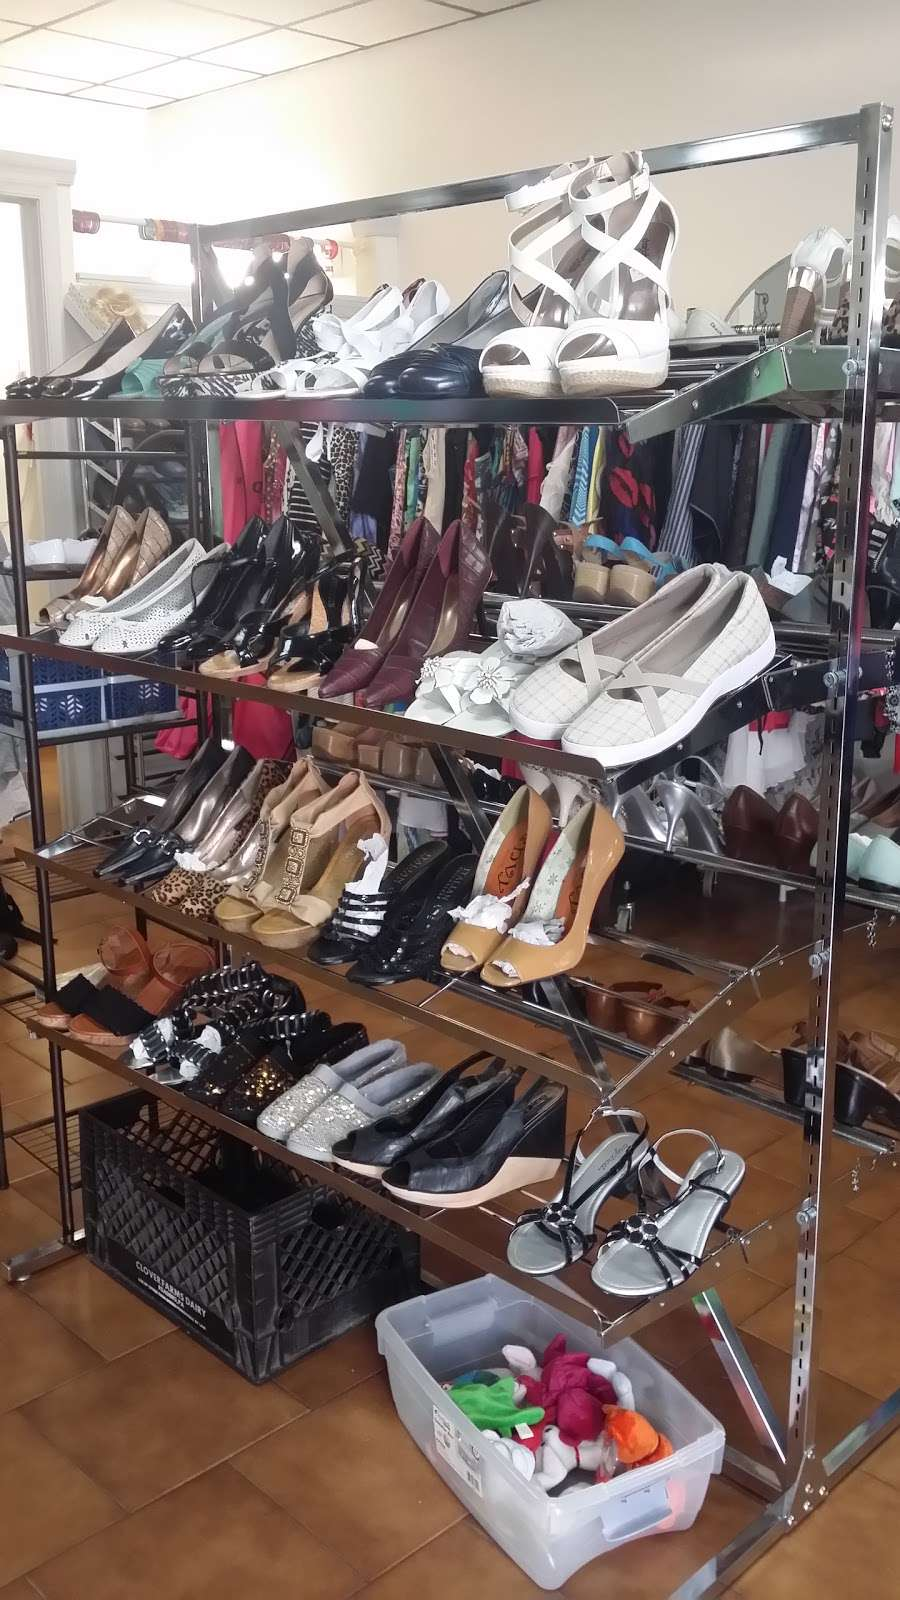 Glow Thrift Shop Store - clothing store  | Photo 3 of 10 | Address: 561 Palisade Ave, Jersey City, NJ 07307, USA | Phone: (646) 399-7397